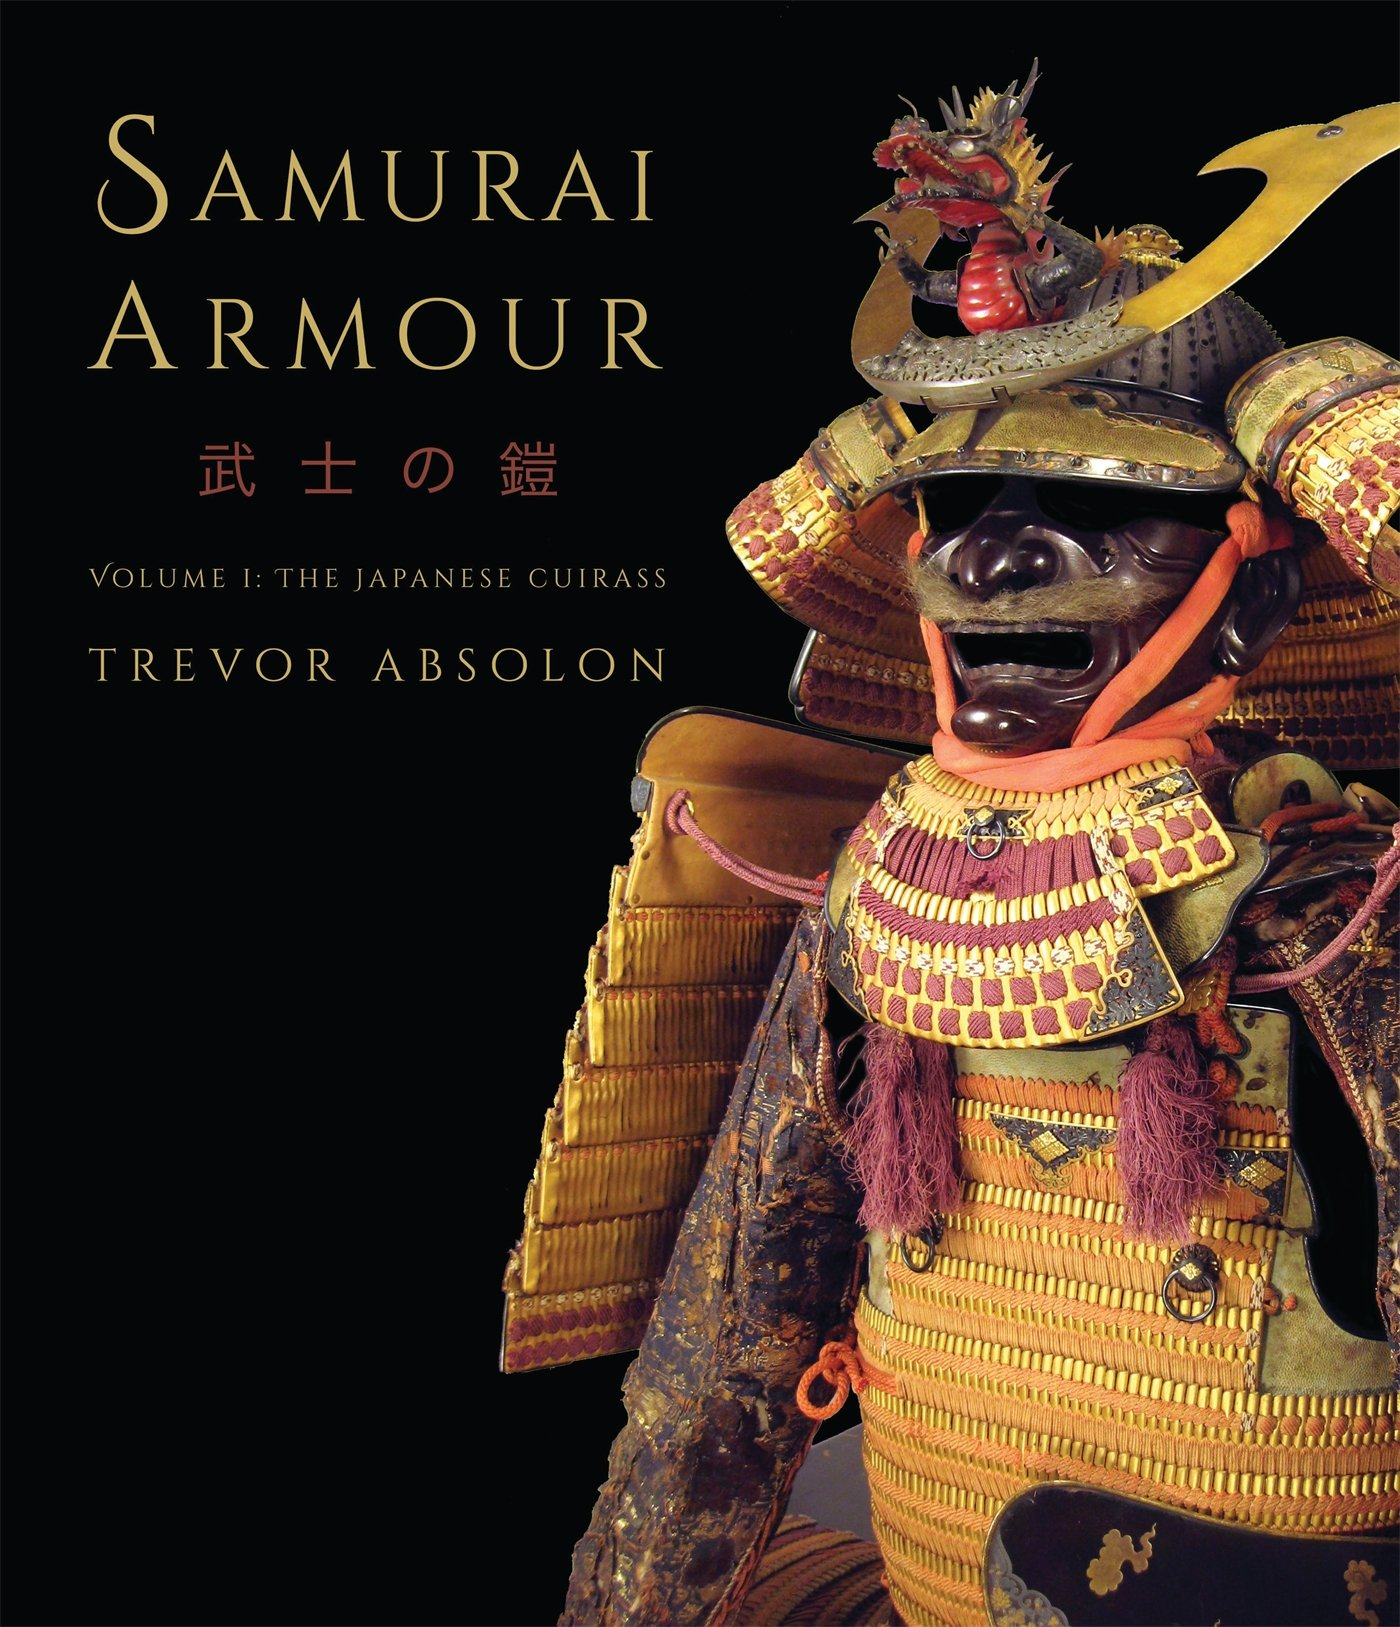 Samurai Armour  Volume I  The Japanese Cuirass  General Military